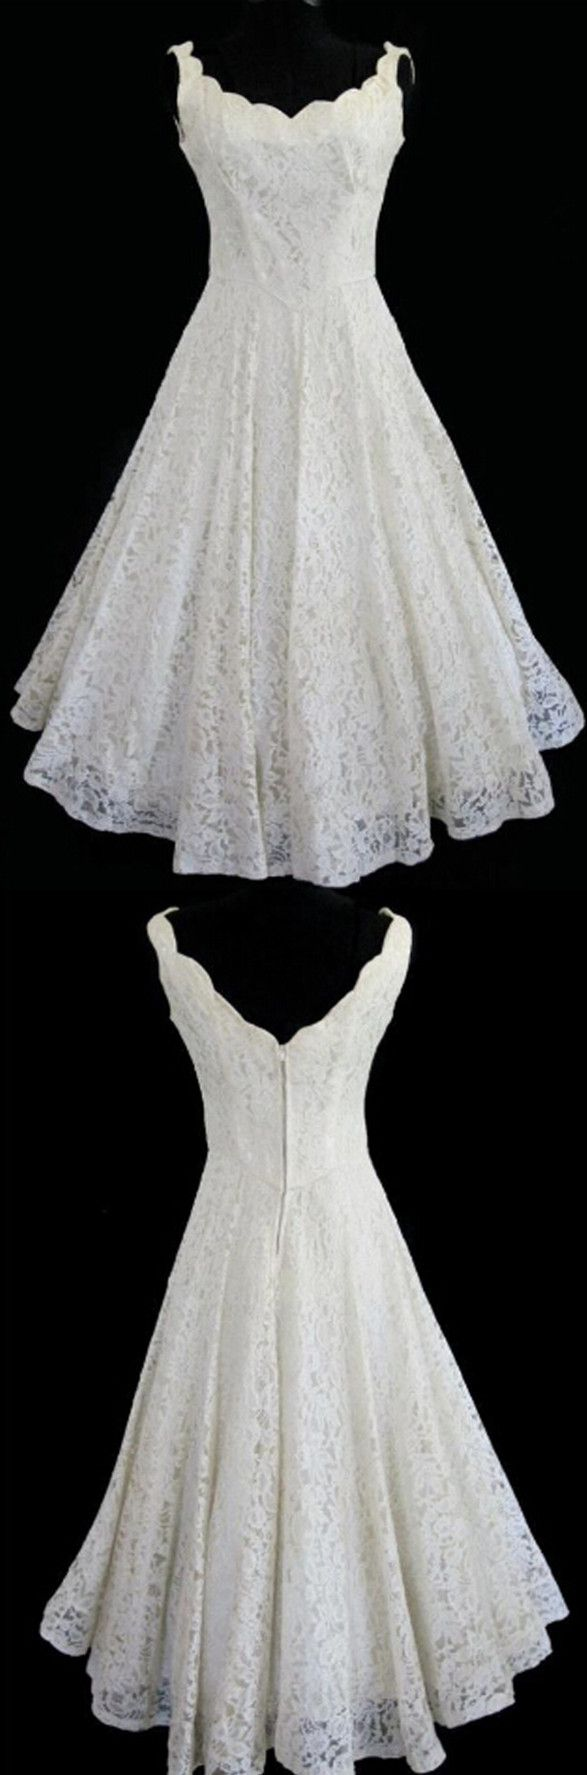 short lace beach wedding dresses, elegant vintage wedding dresses, simple wedding dresses